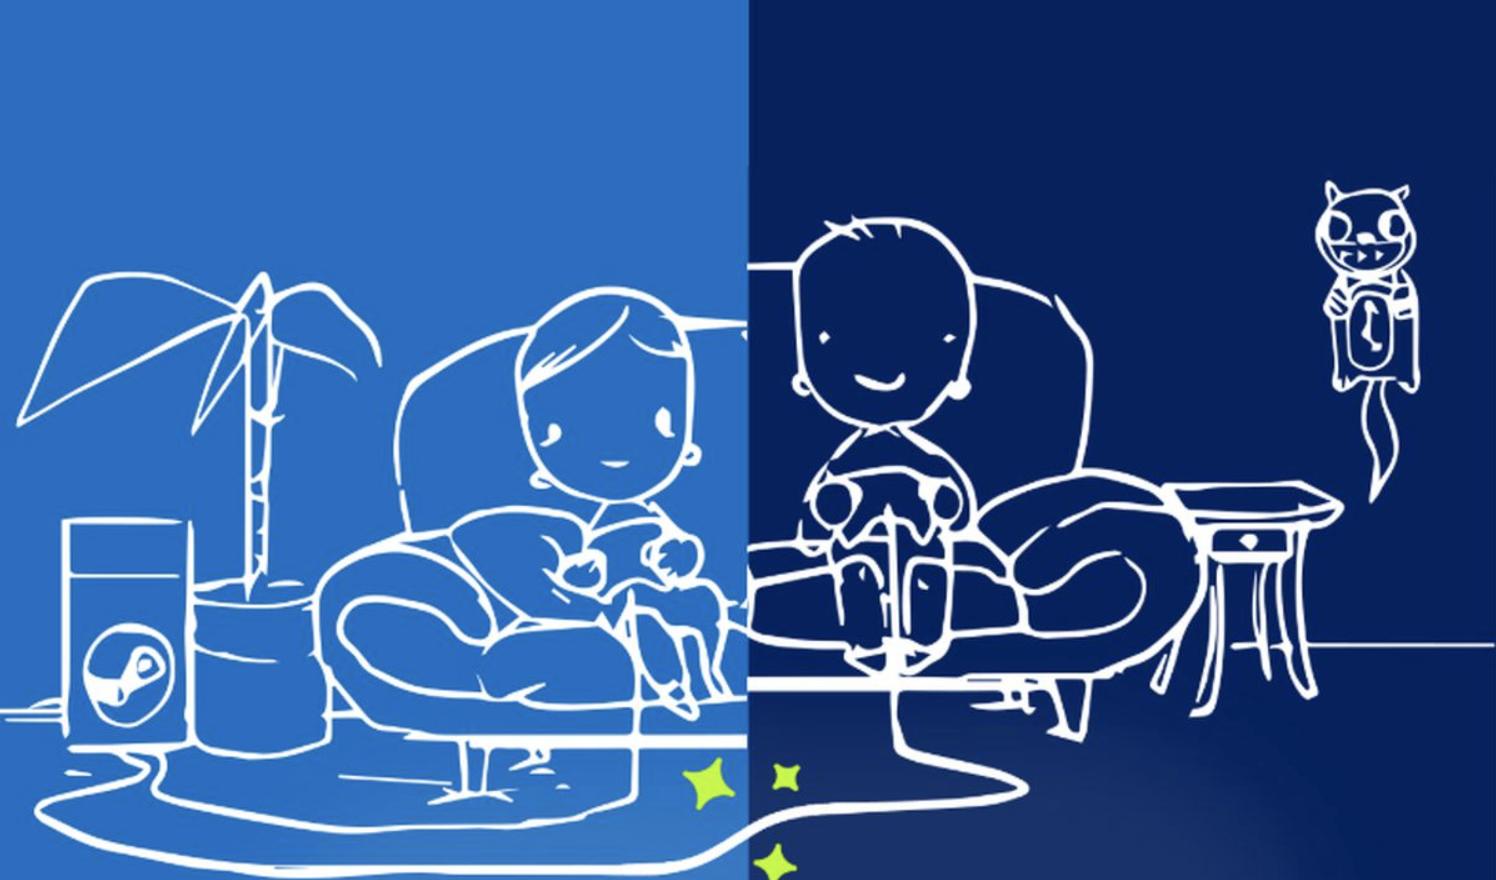 steam-remove-play-together-funksjon